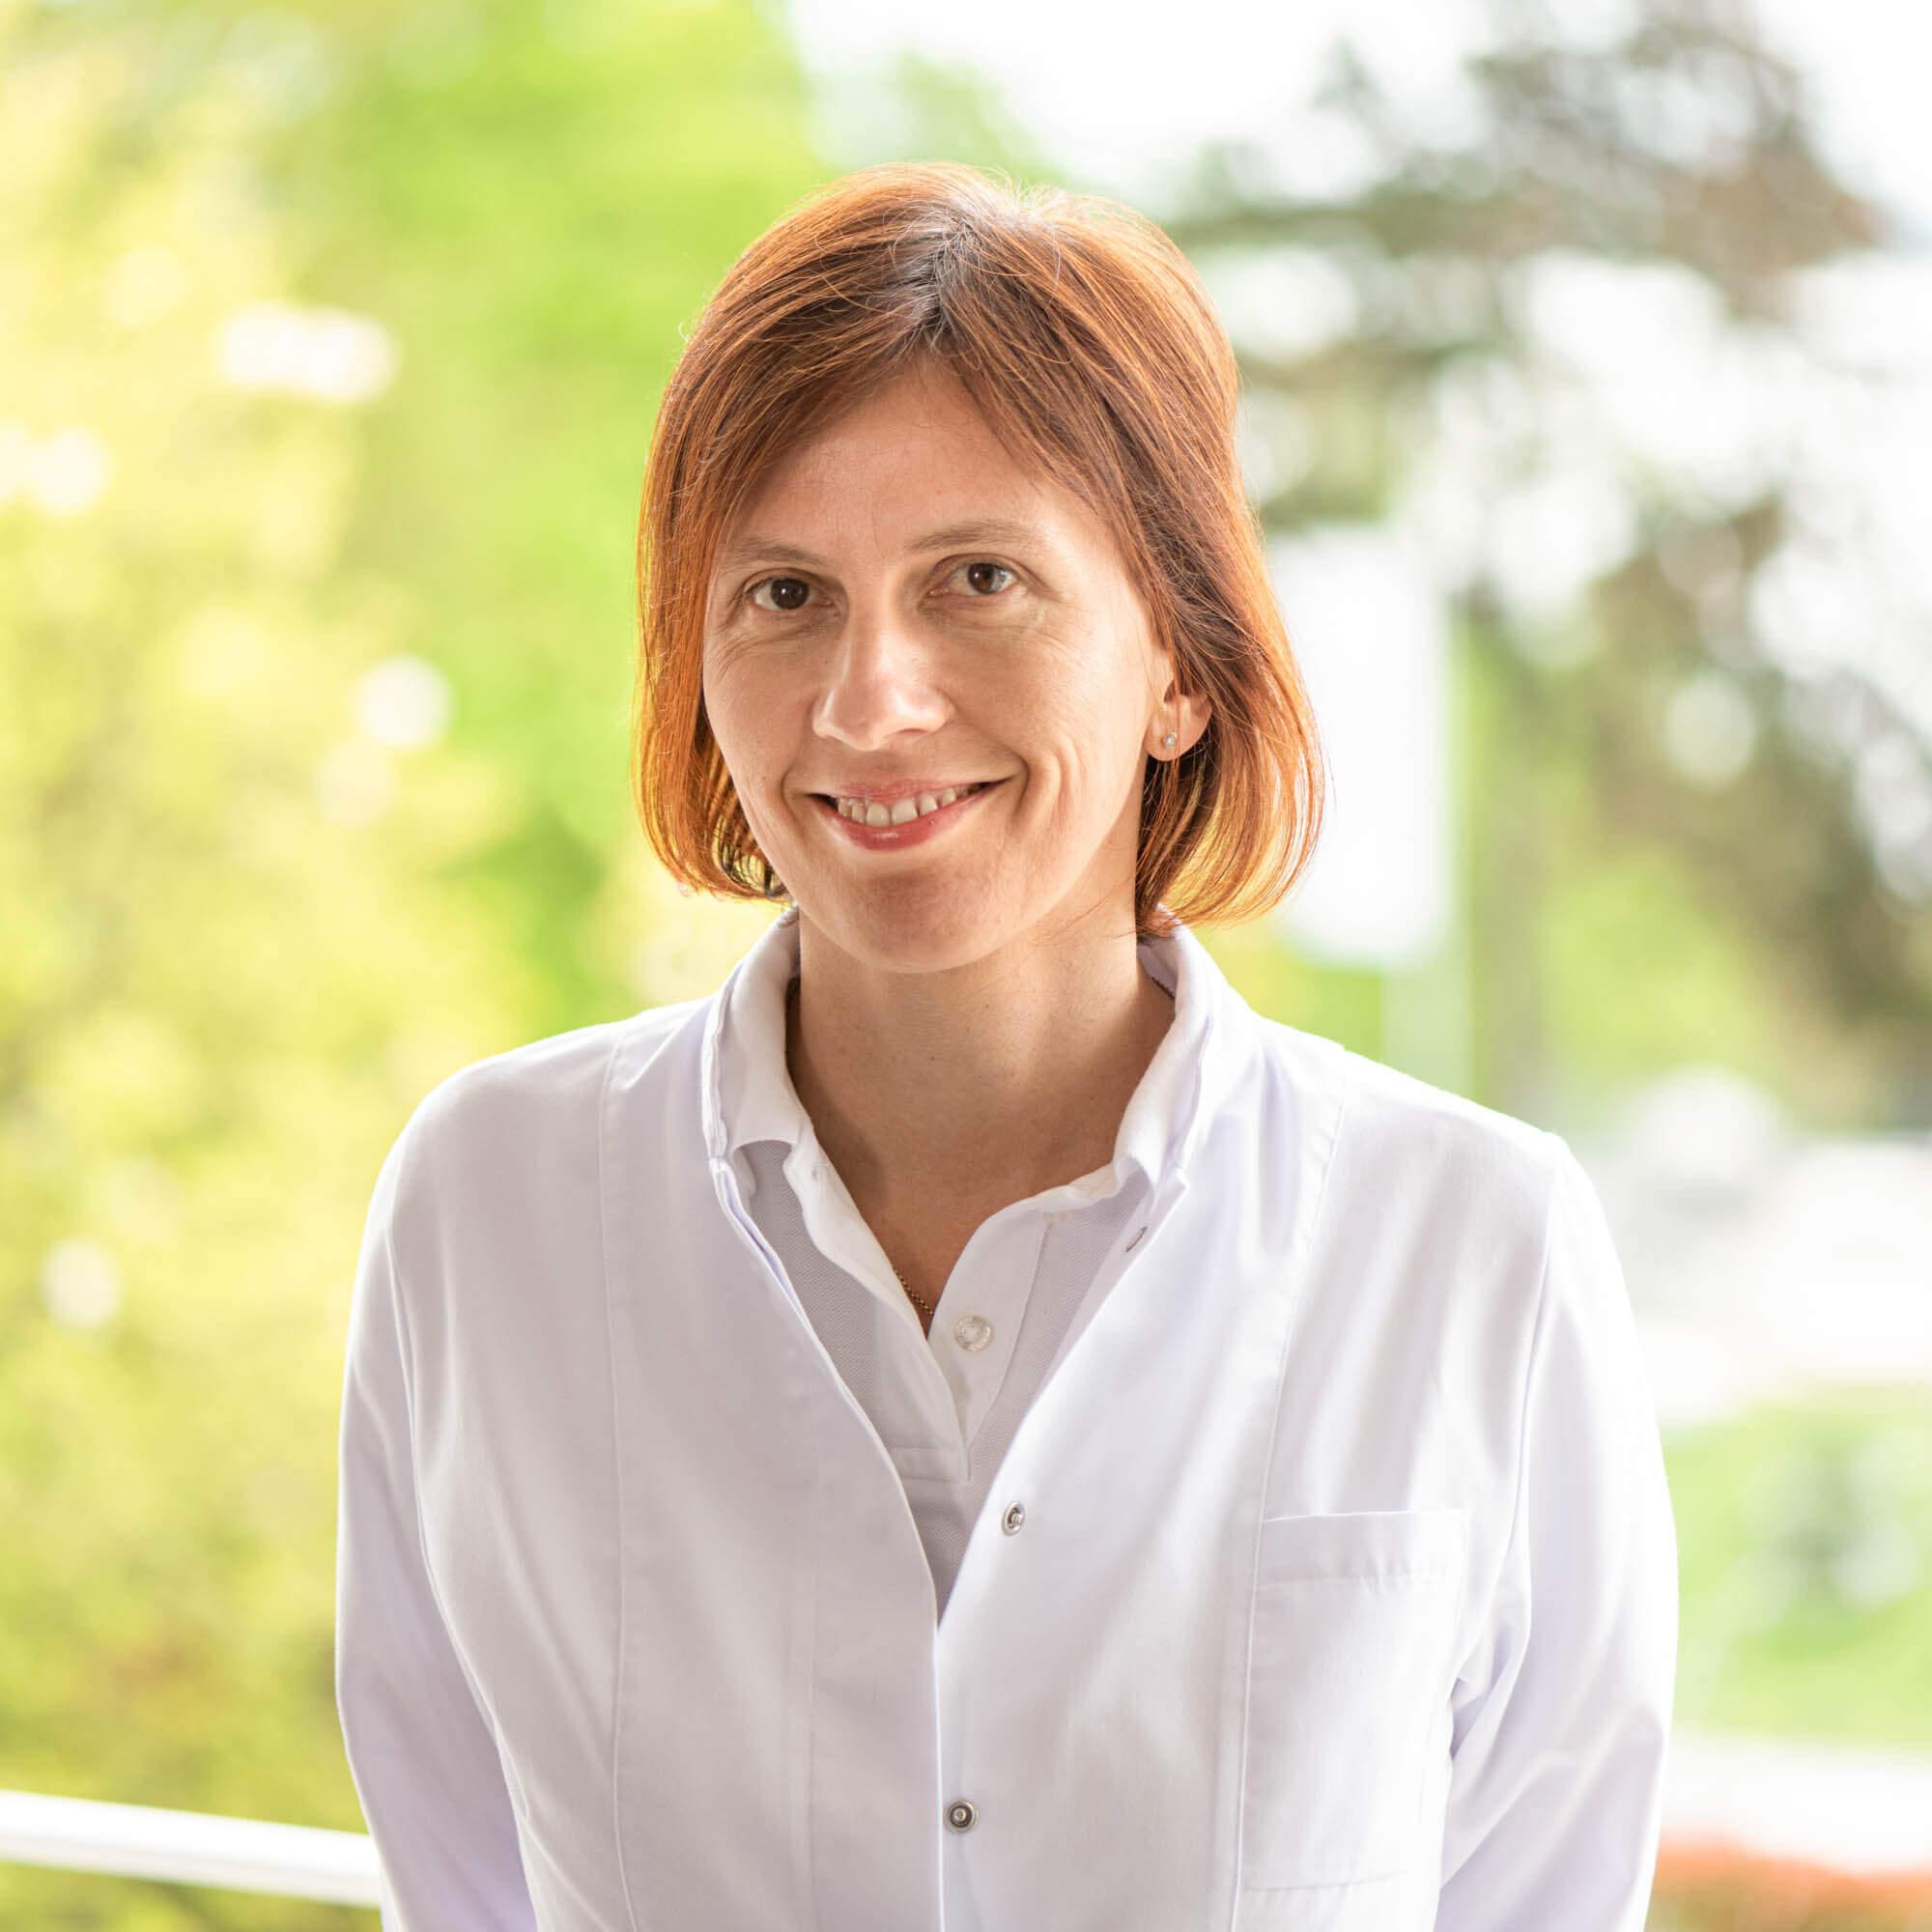 Dr. Sandra van Waegeningh